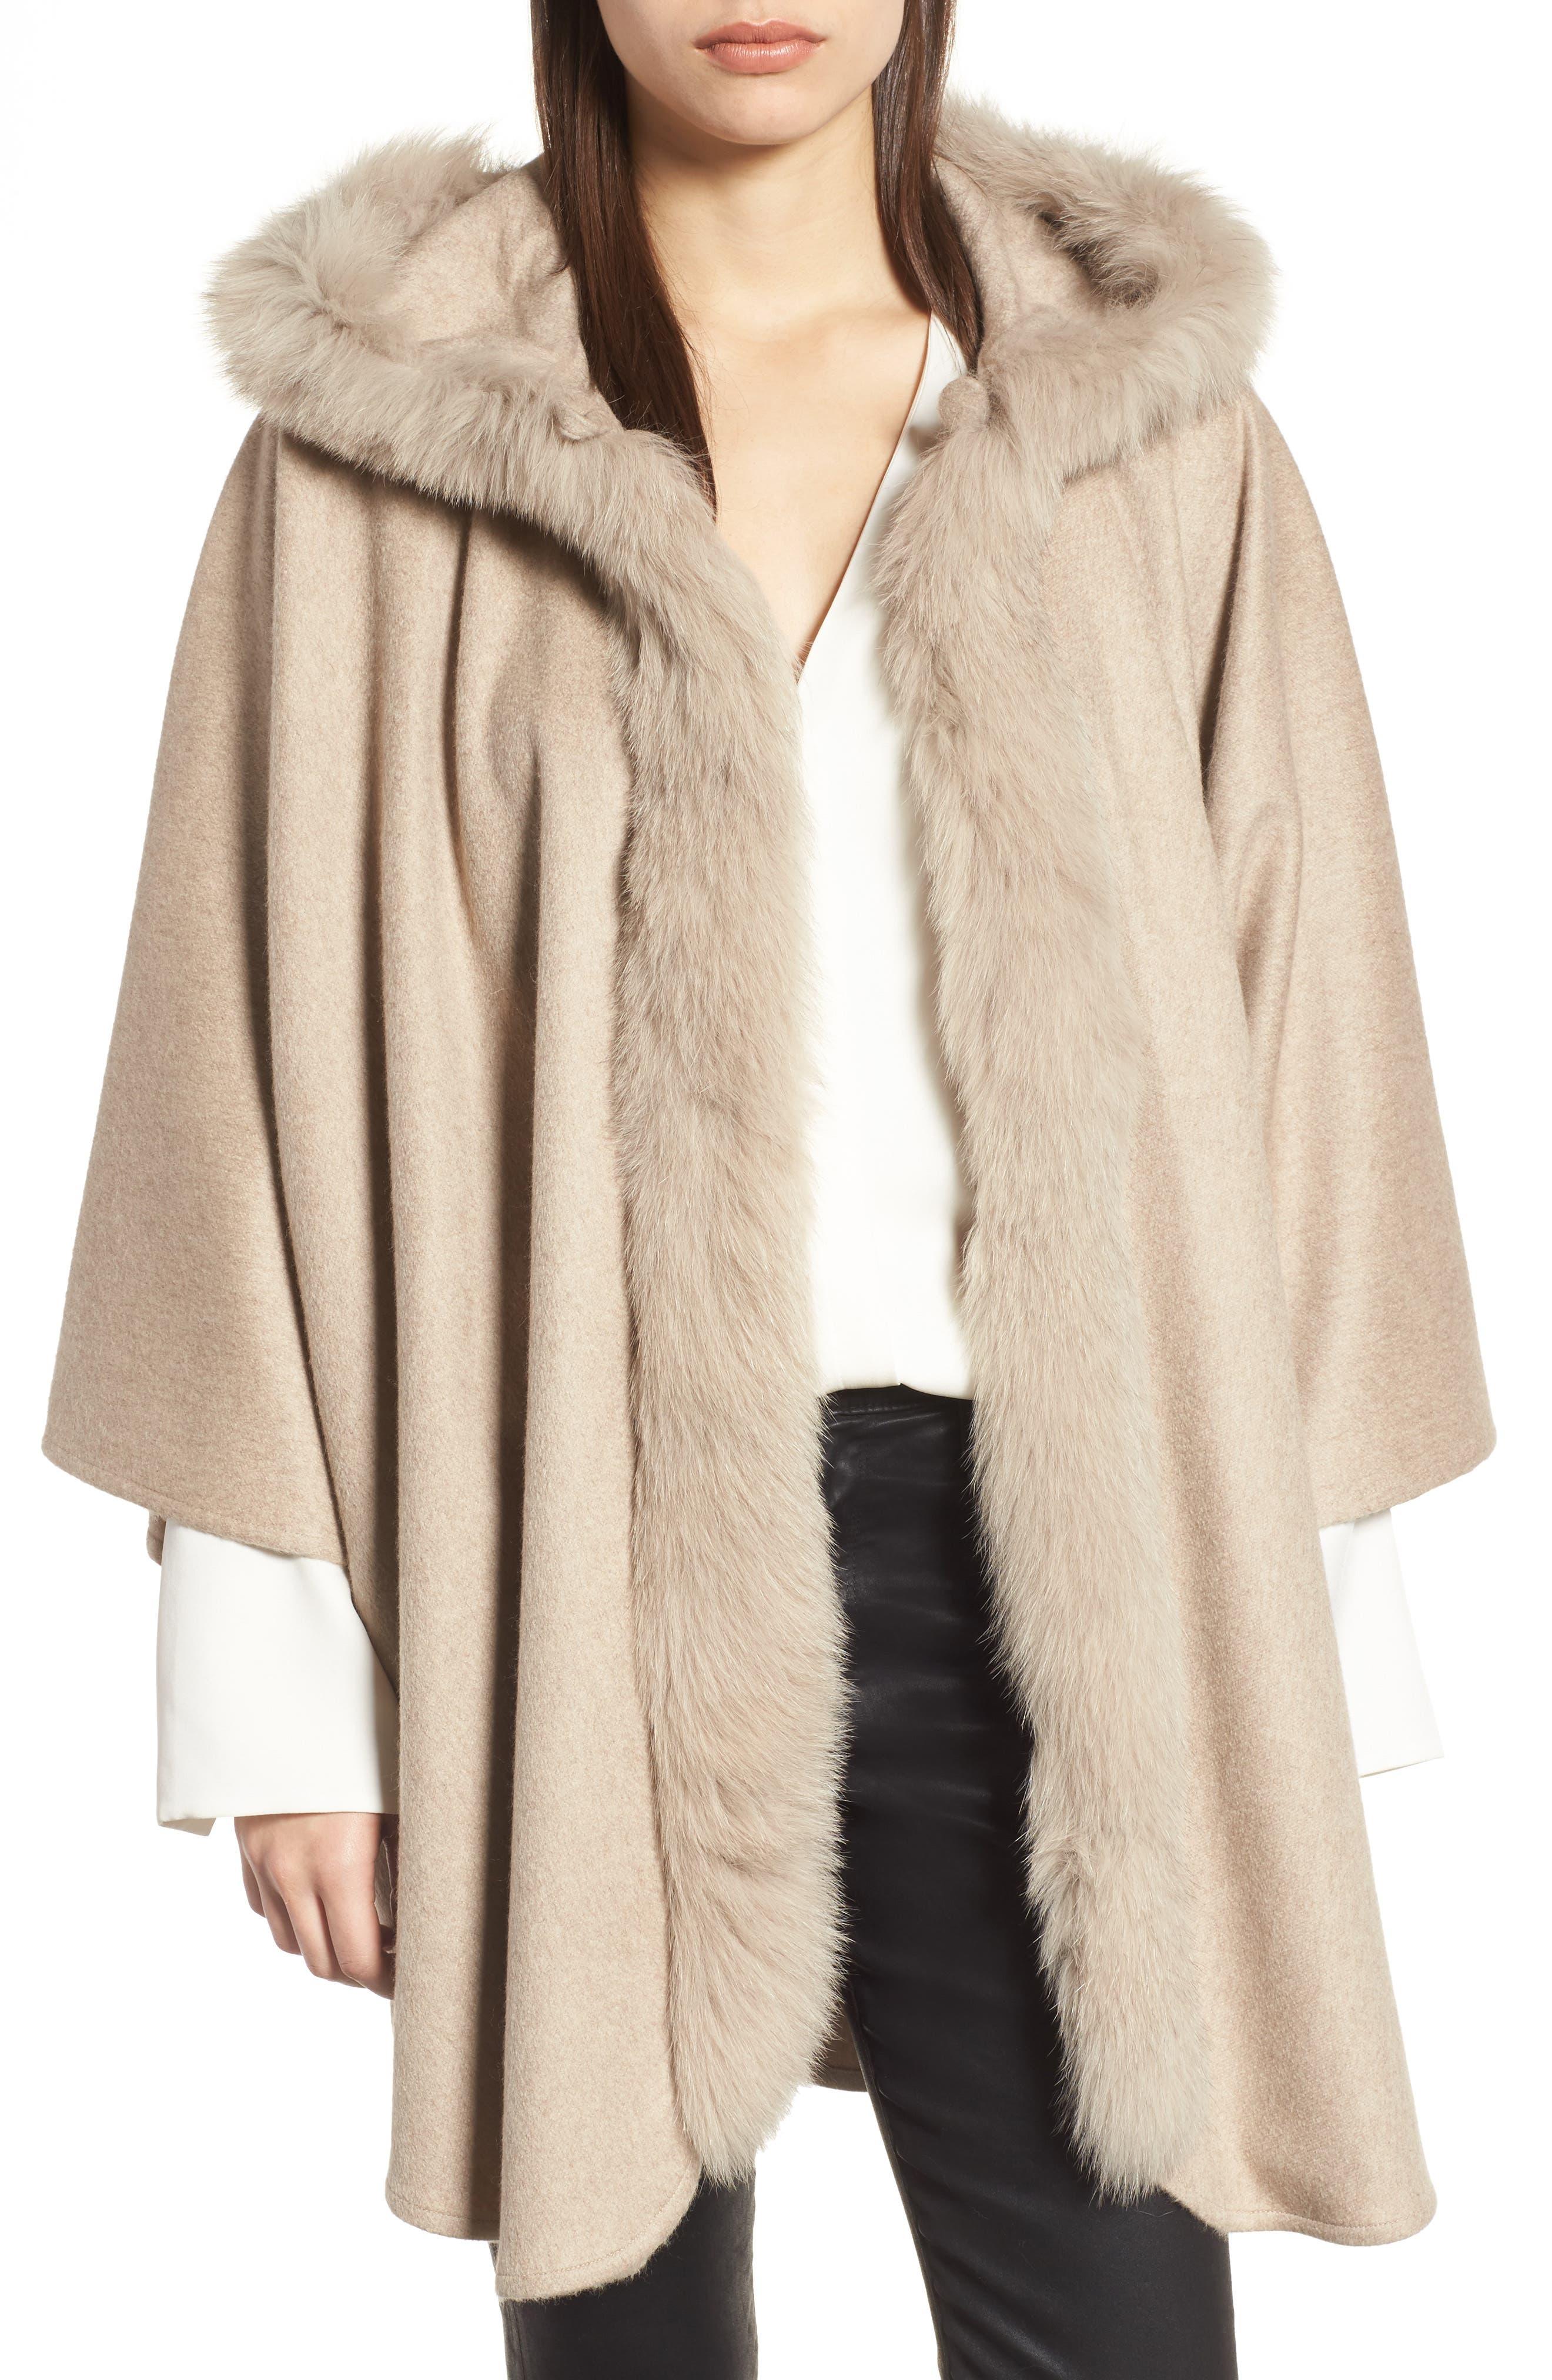 Alternate Image 1 Selected - Max Mara Cashmere Hooded Cape with Genuine Fox Fur Trim